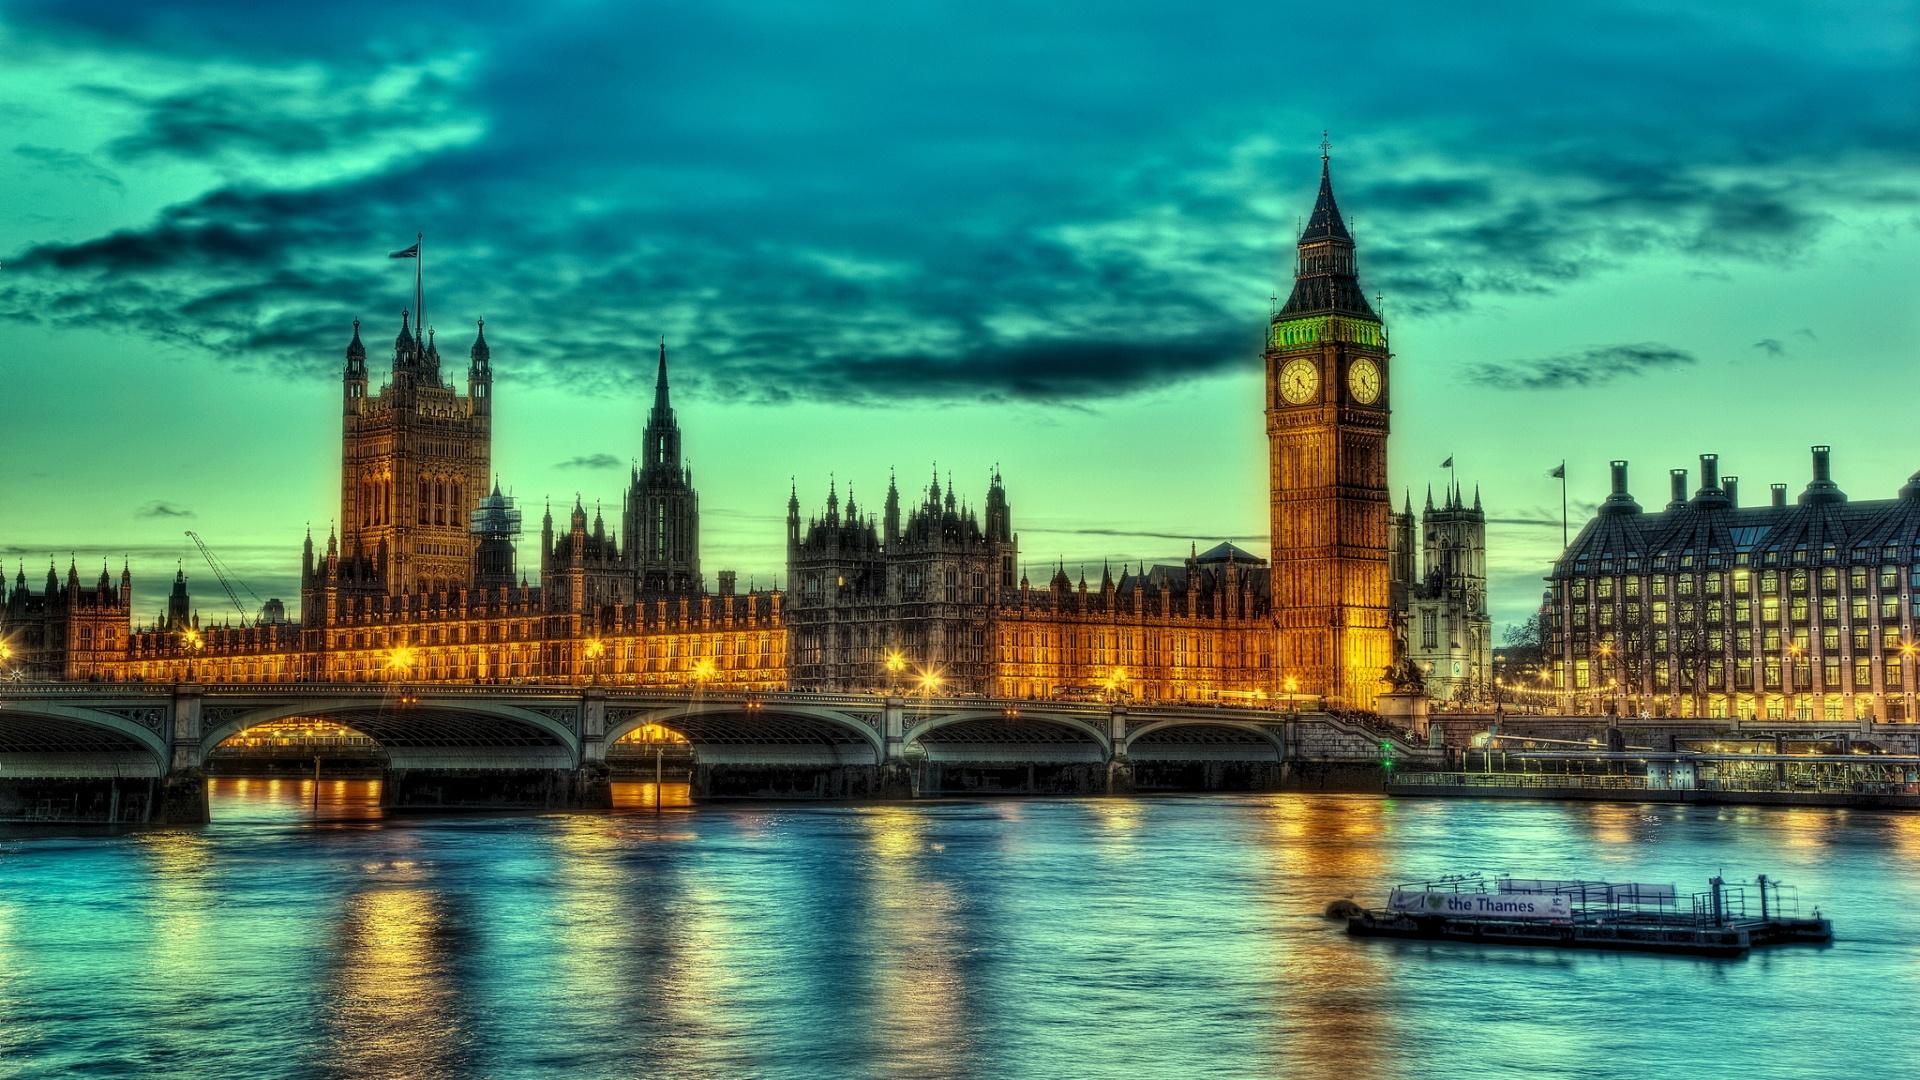 London England Wallpaper PC Wallpaper WallpaperLepi 1920x1080